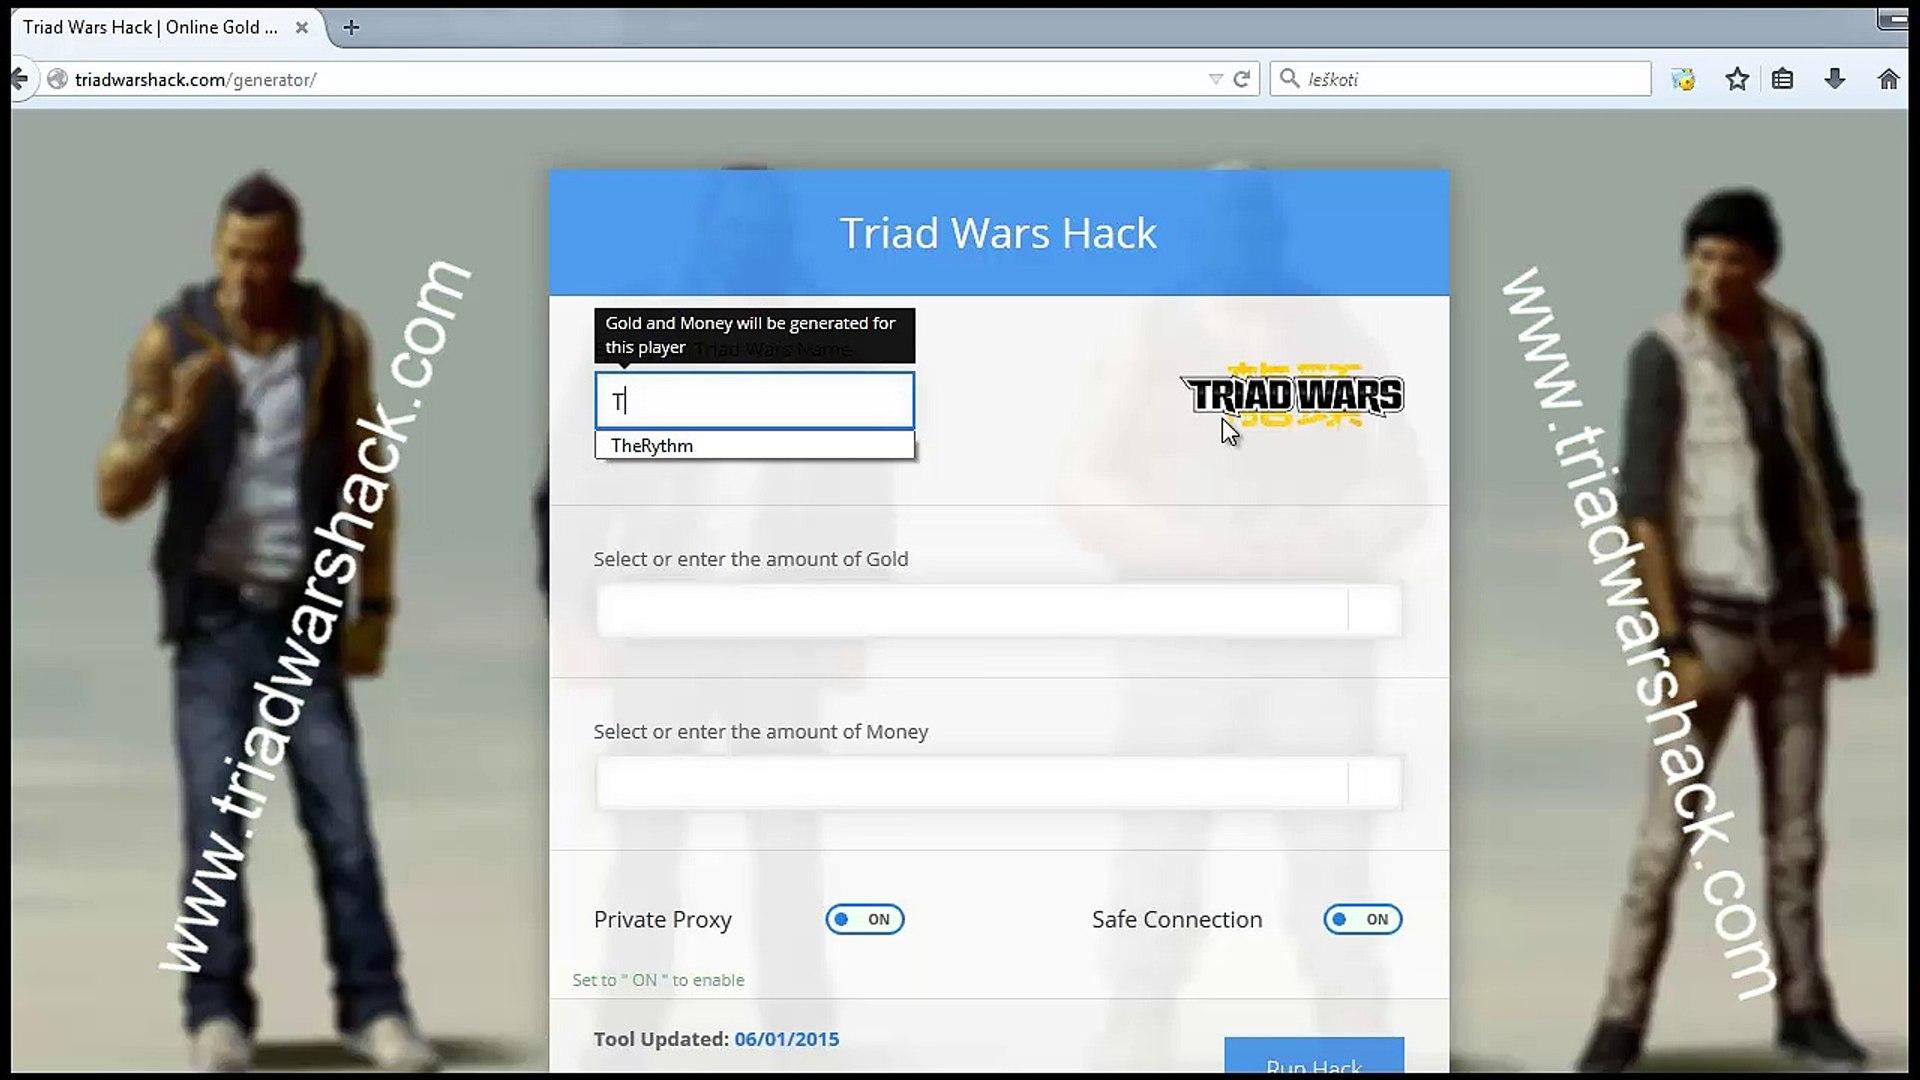 Triad Wars Money and Gold Generator - First working Triad Wars Cheats